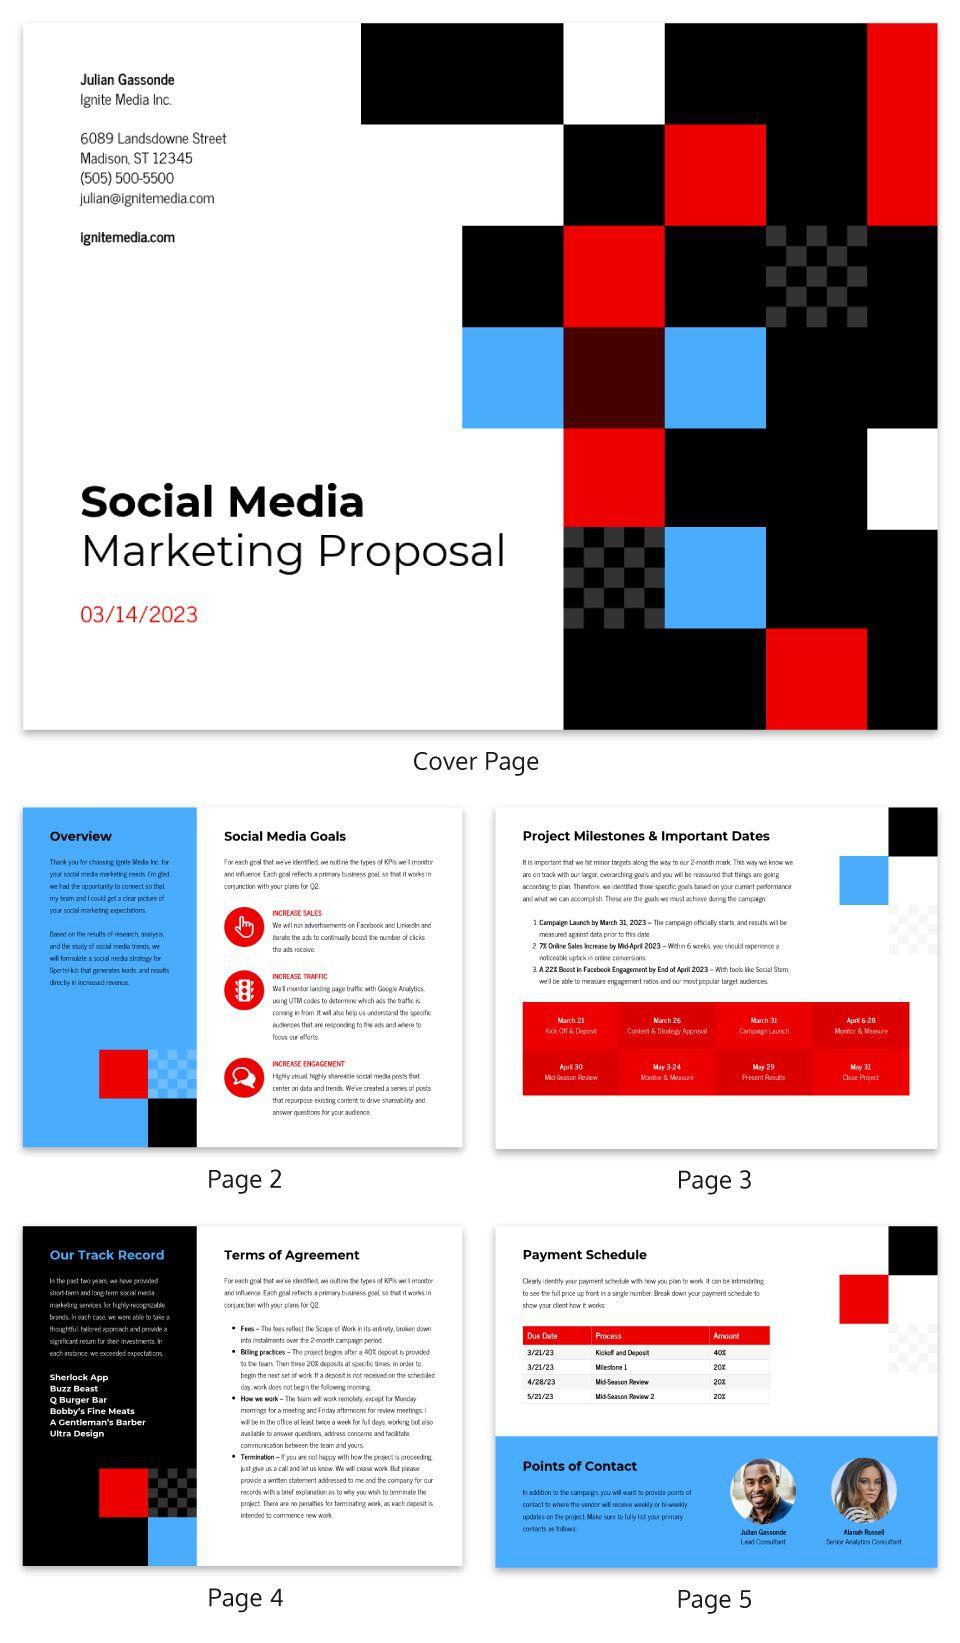 007 Dreaded Social Media Proposal Template High Resolution  Ppt Marketing Word 2019Full